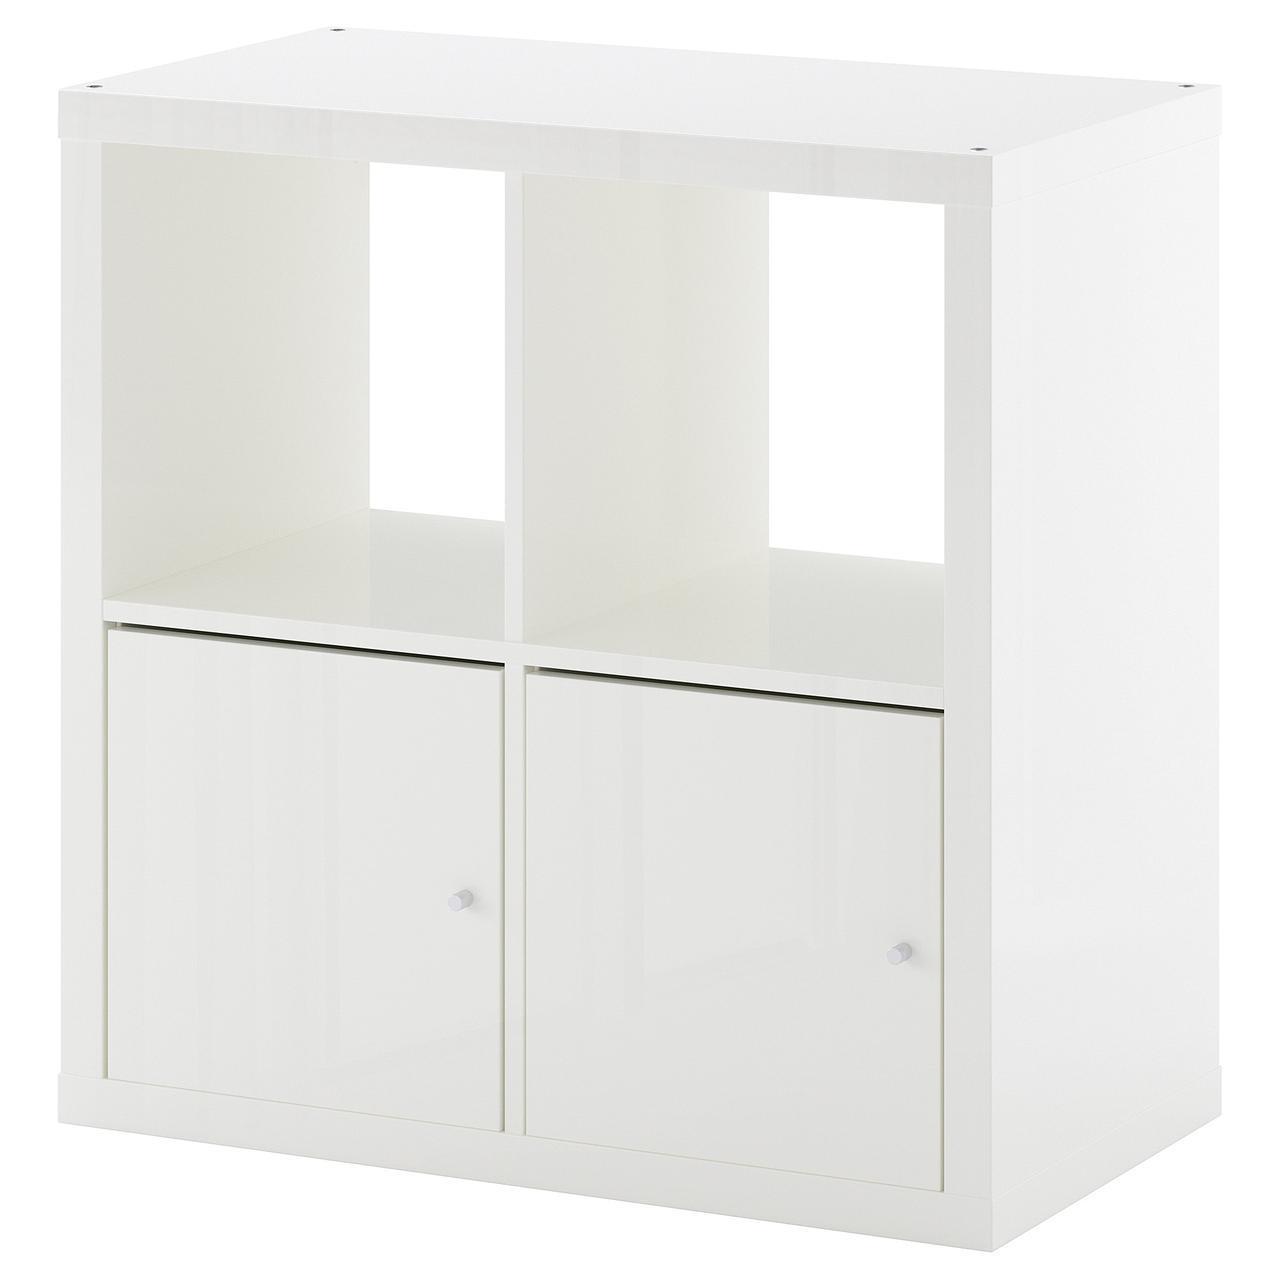 Стеллаж IKEA KALLAX 77x77 см белый глянцевый 892.782.78